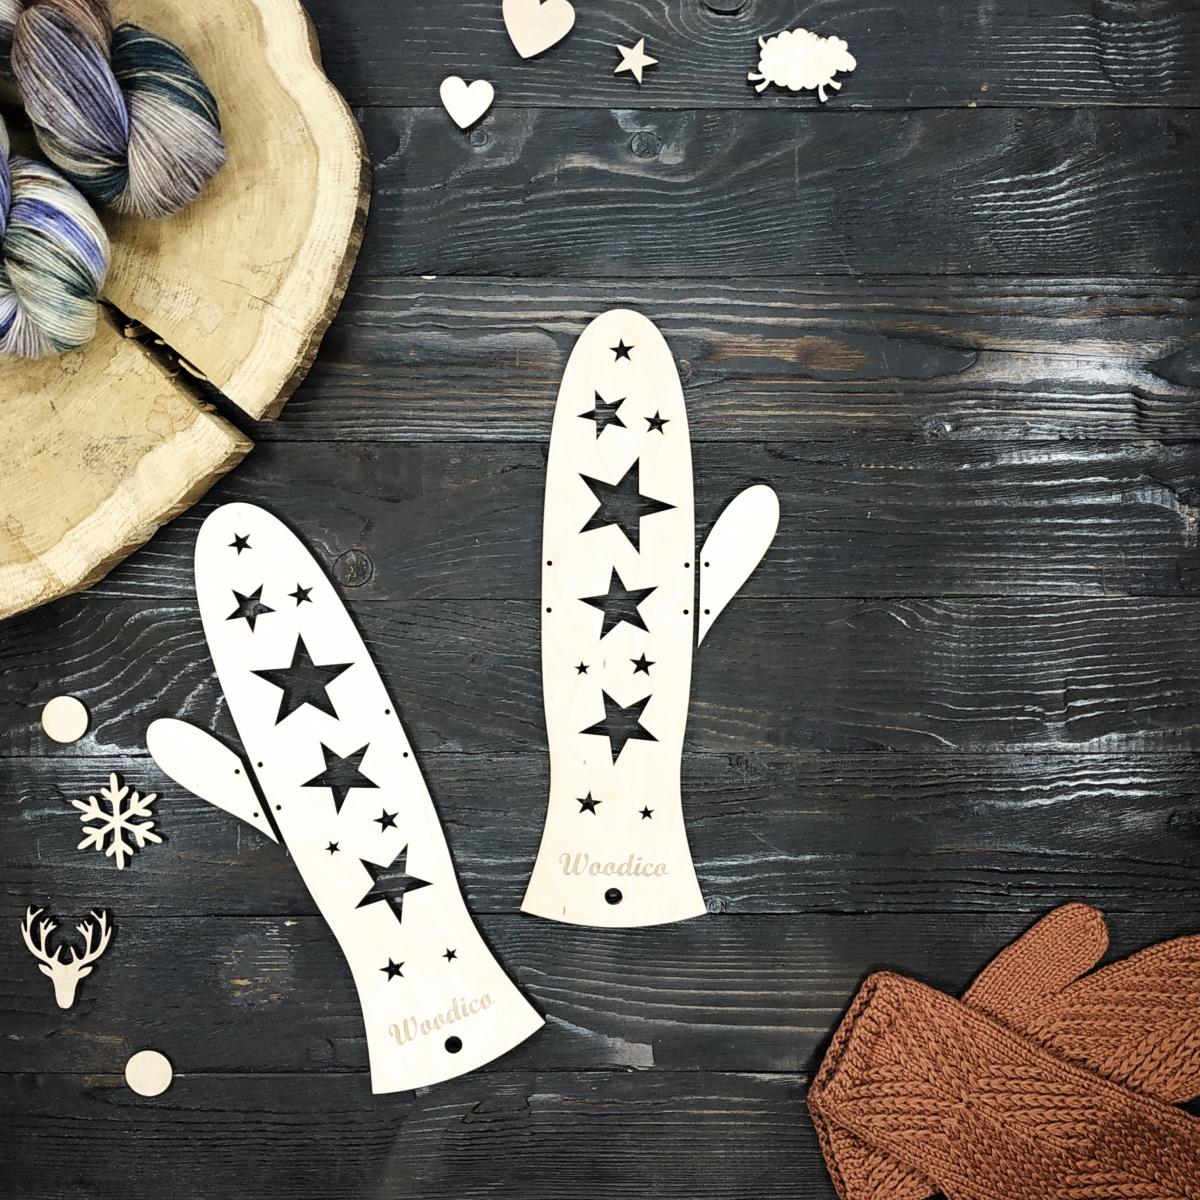 woodico.pro wooden mitten blockers stars 1 1200x1200 - Wooden mitten blockers / Stars